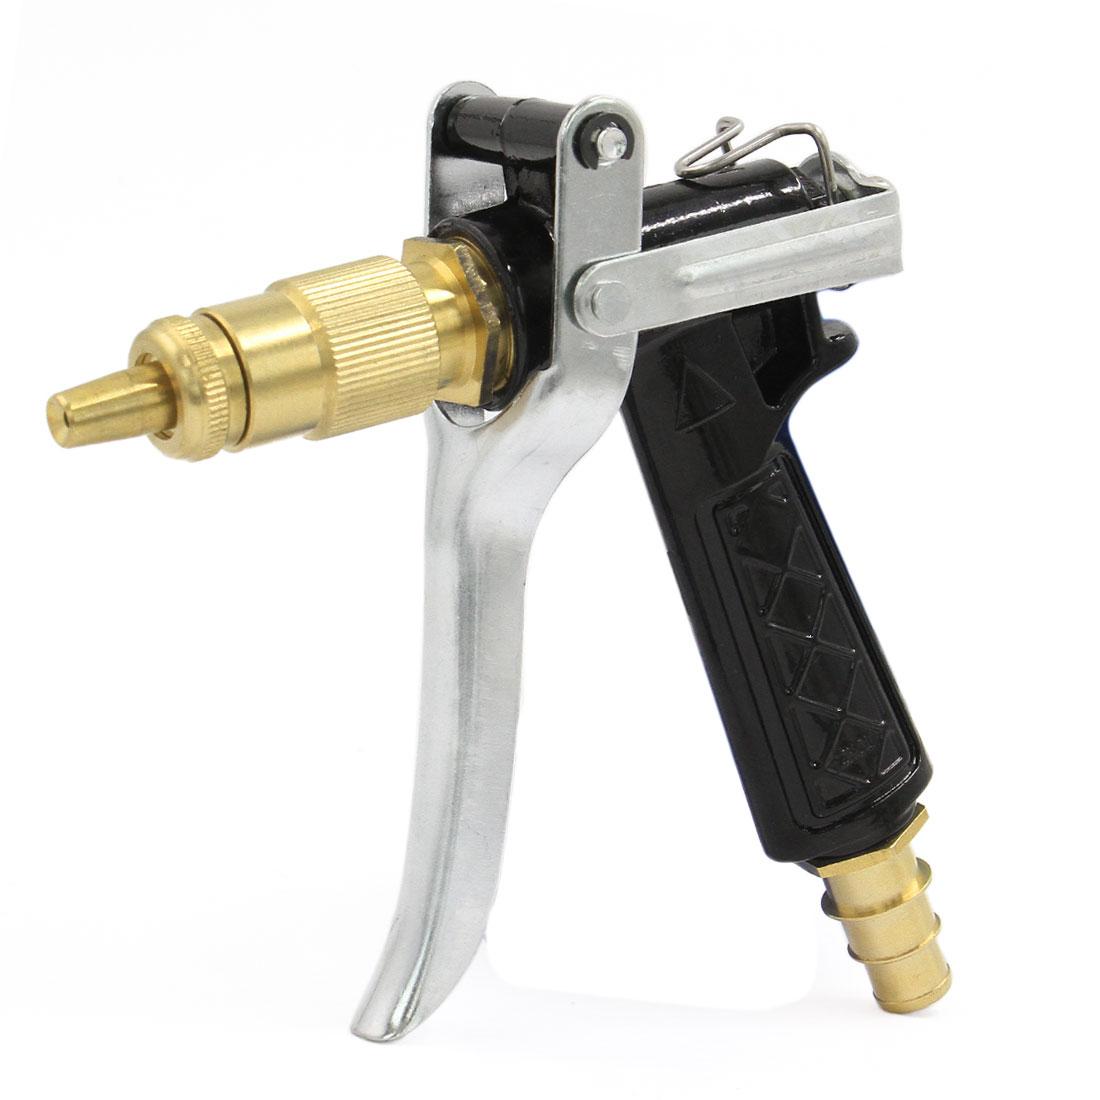 Car Vehicle Washing Garden Brass Head Metal Hose Nozzle Water Gun